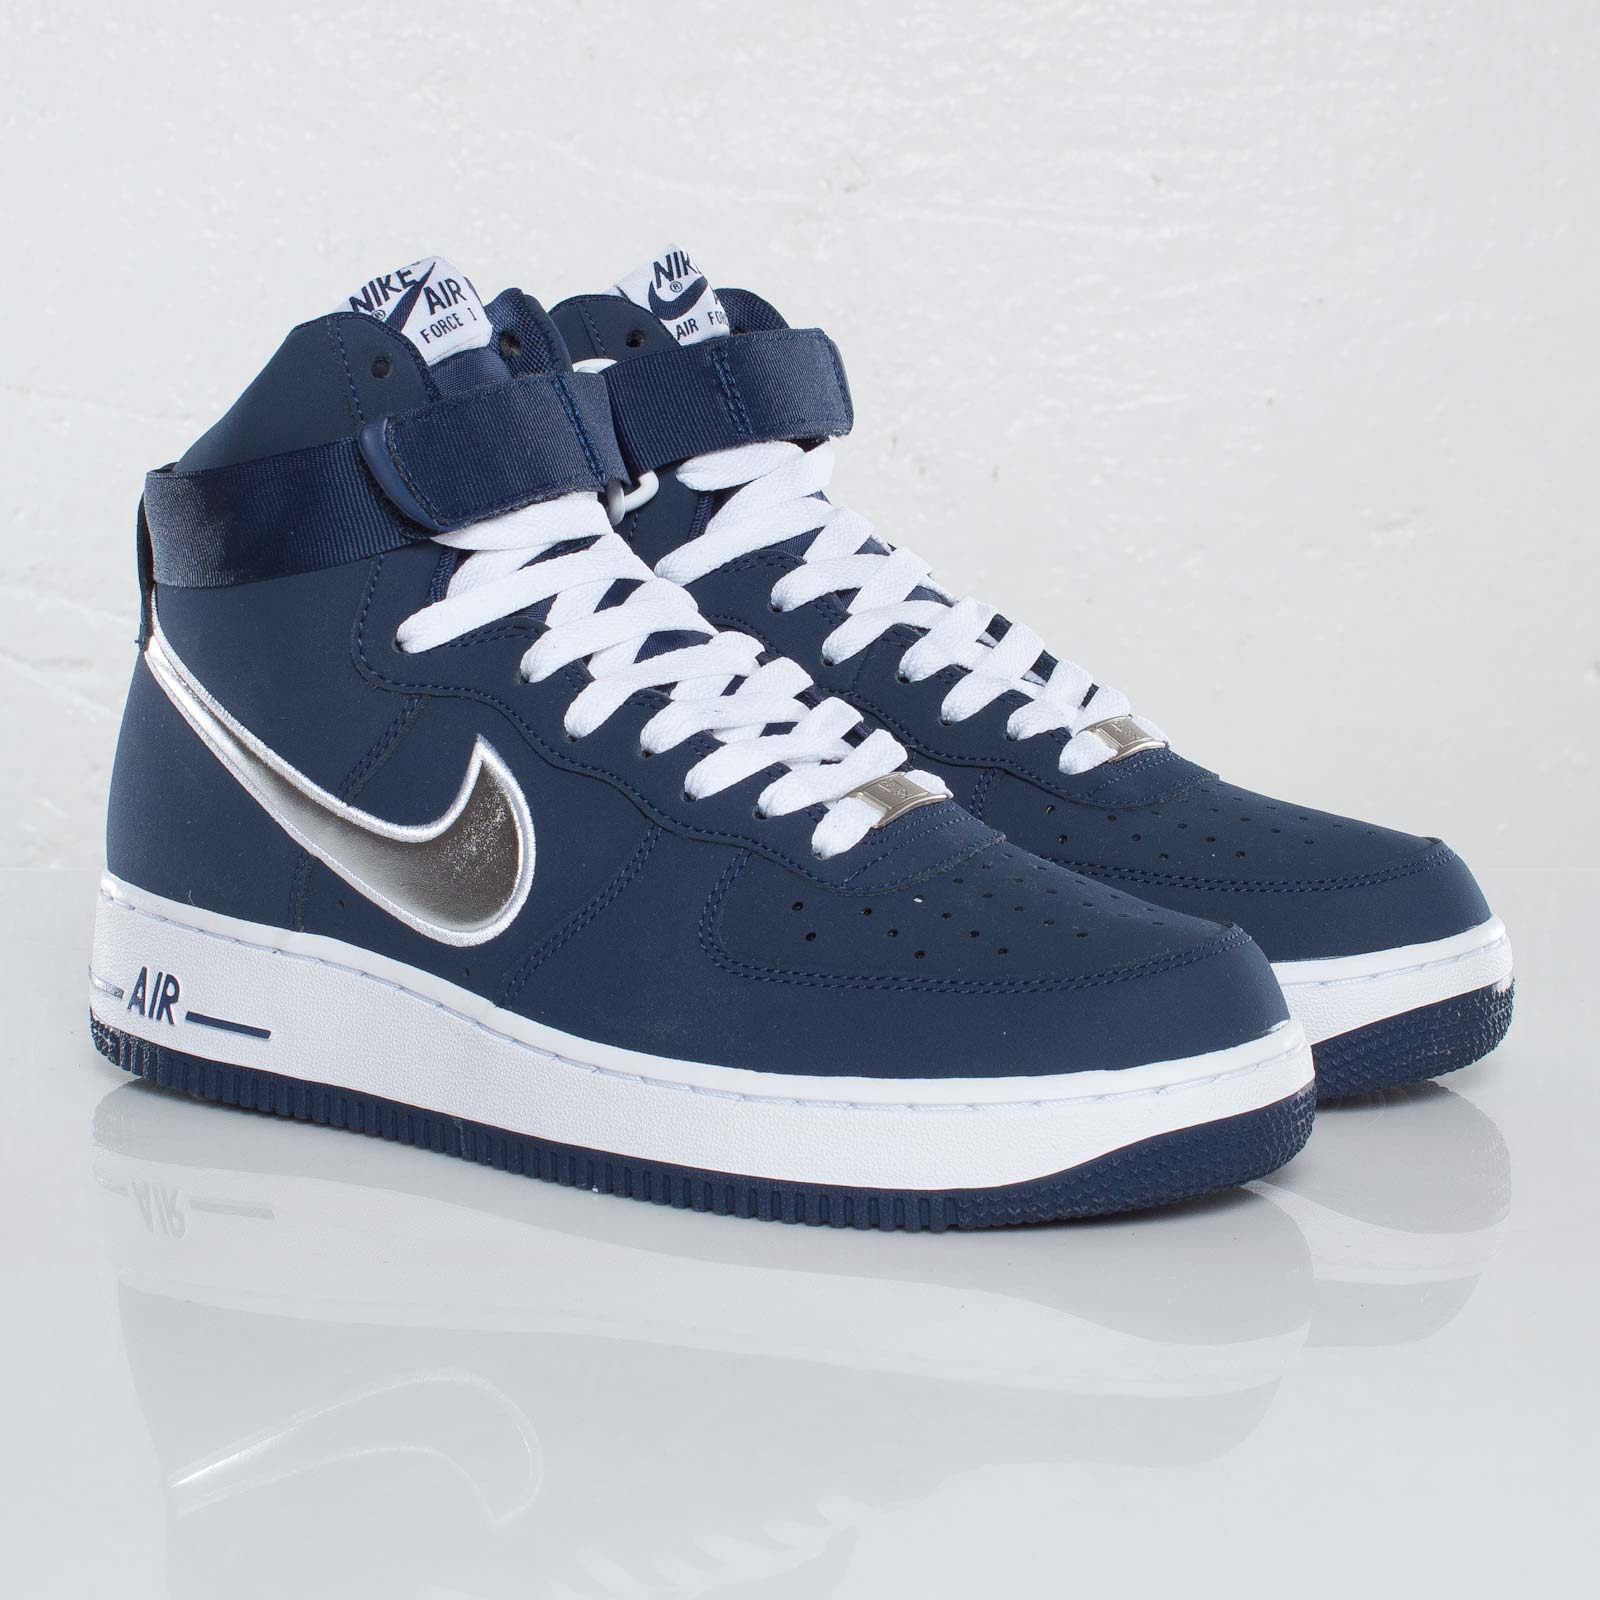 Nike Air Force 1 High ´07 - 111018